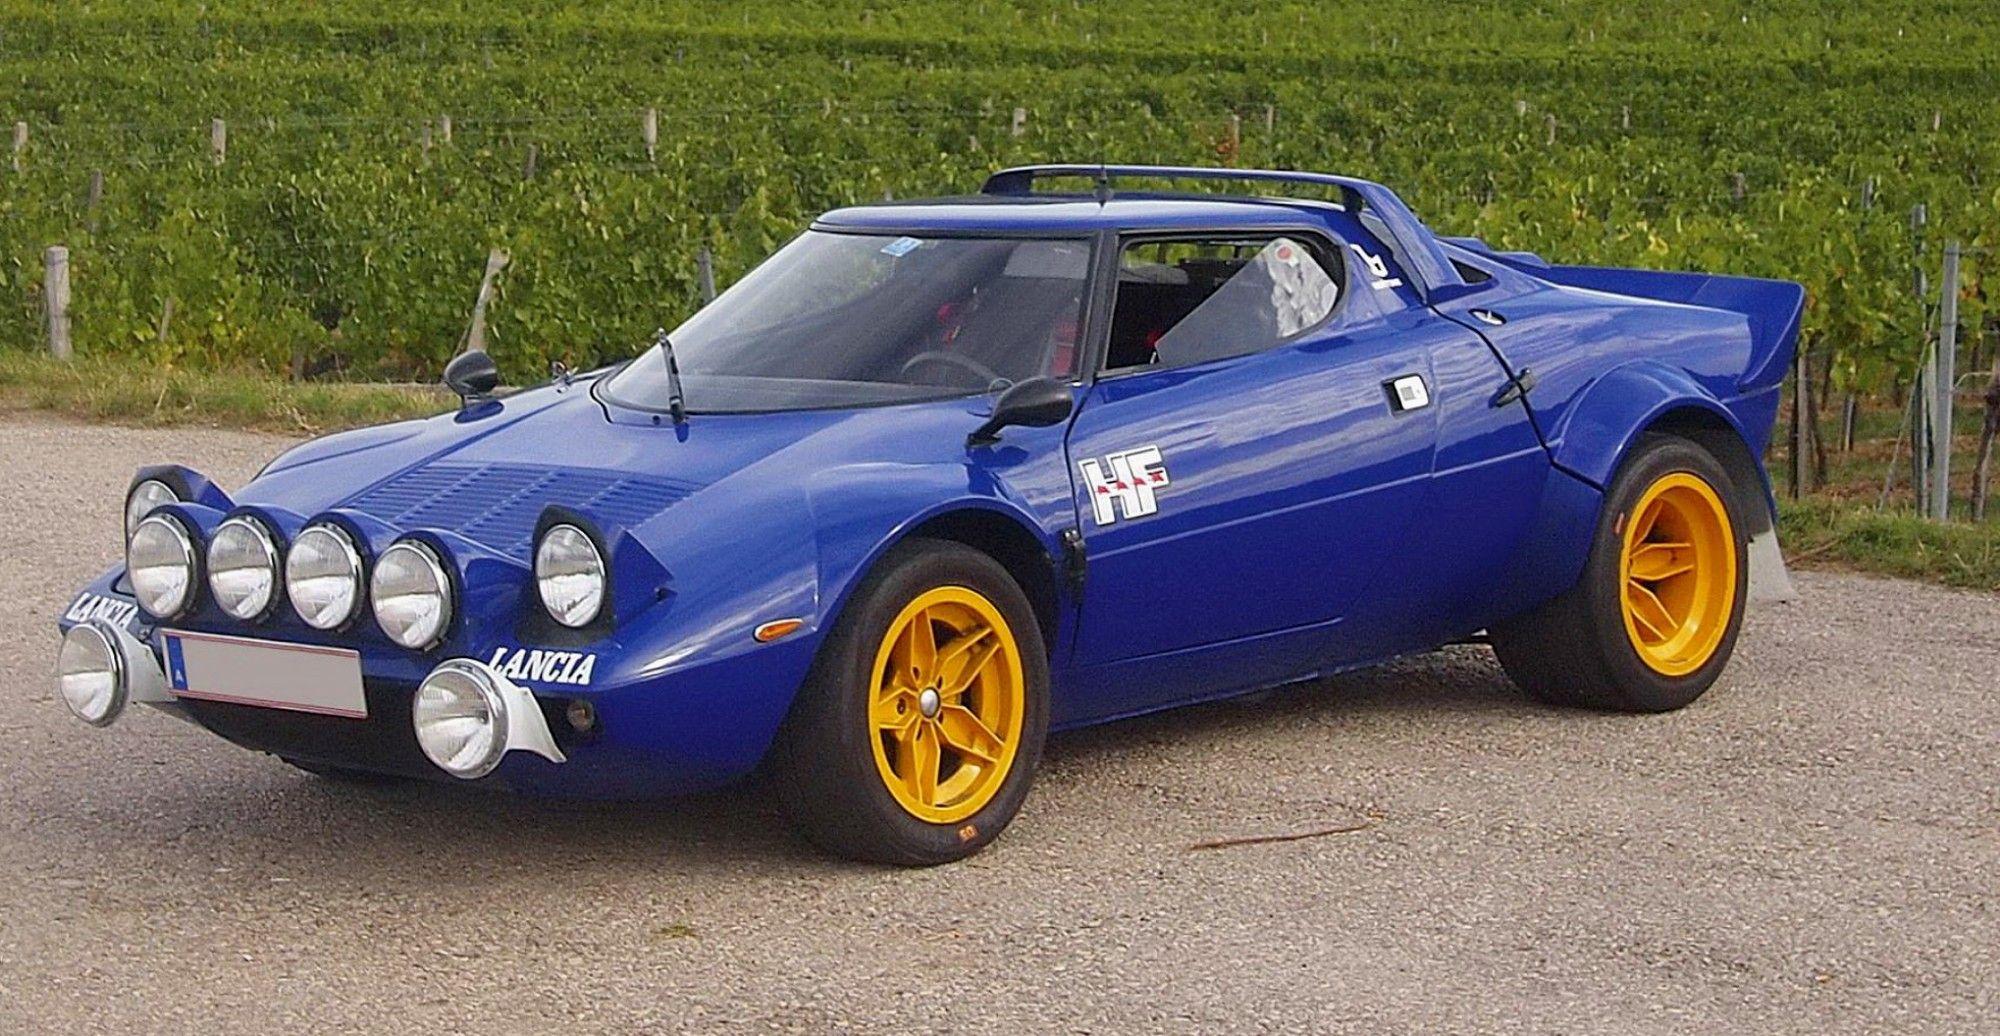 Original Lancia Stratos Group 4 car up for auction through ...